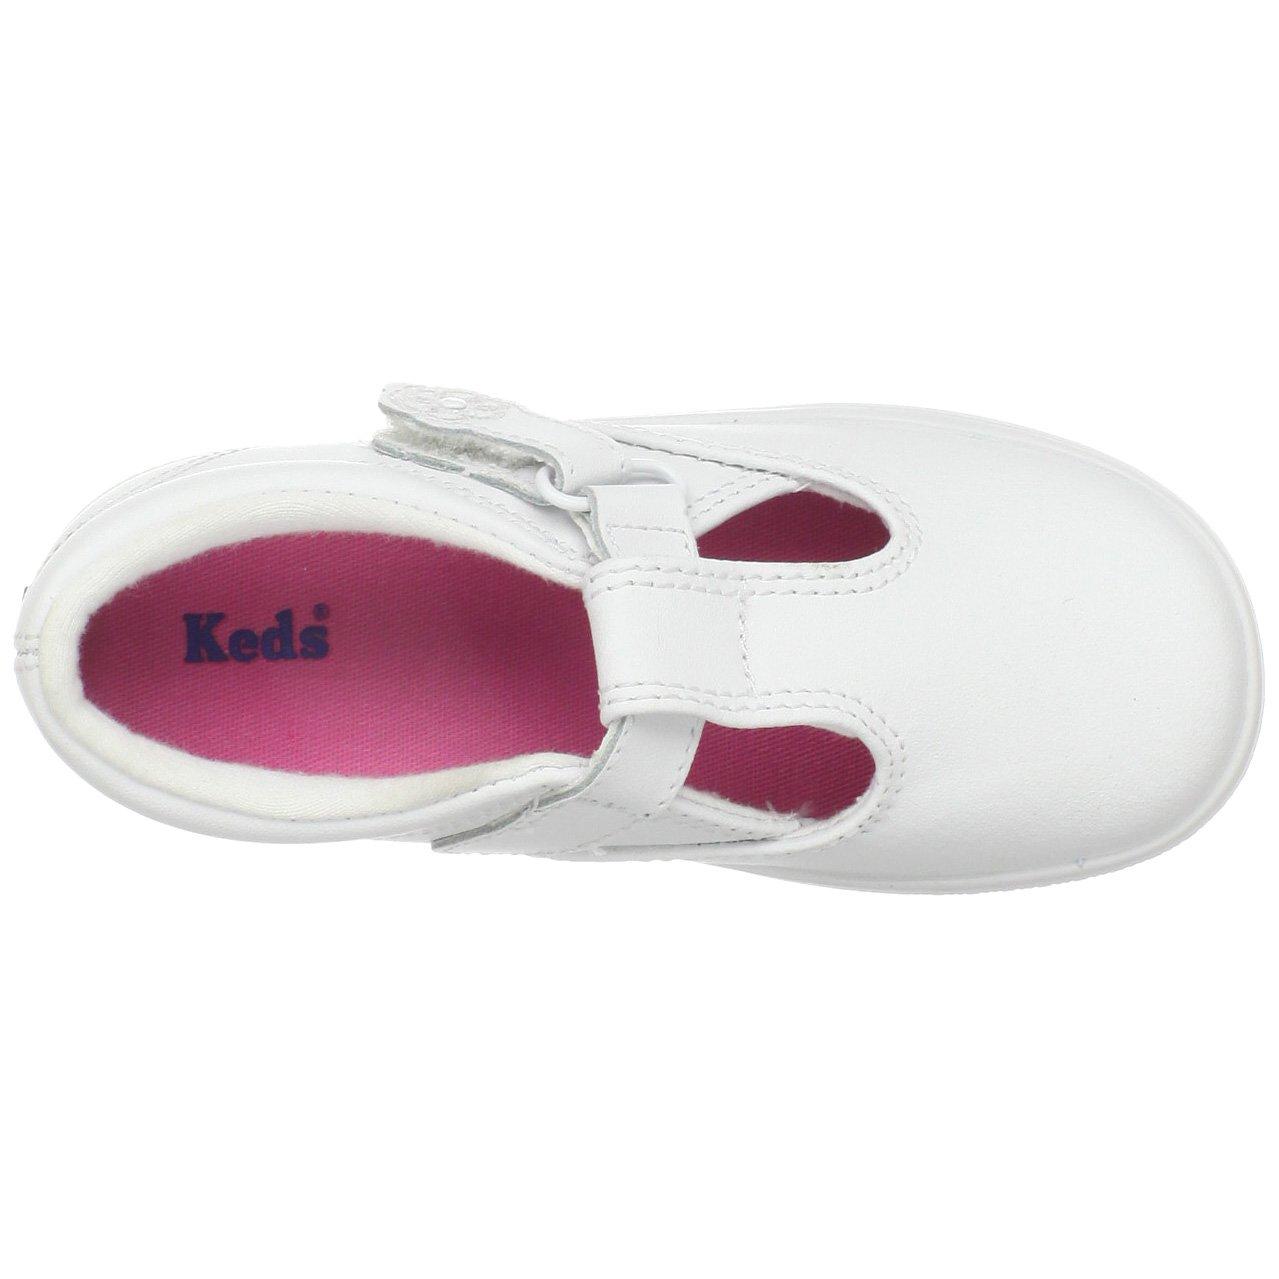 05e77bb7d7eb Amazon.com  Keds girls Daphne T-Strap Sneaker  Shoes